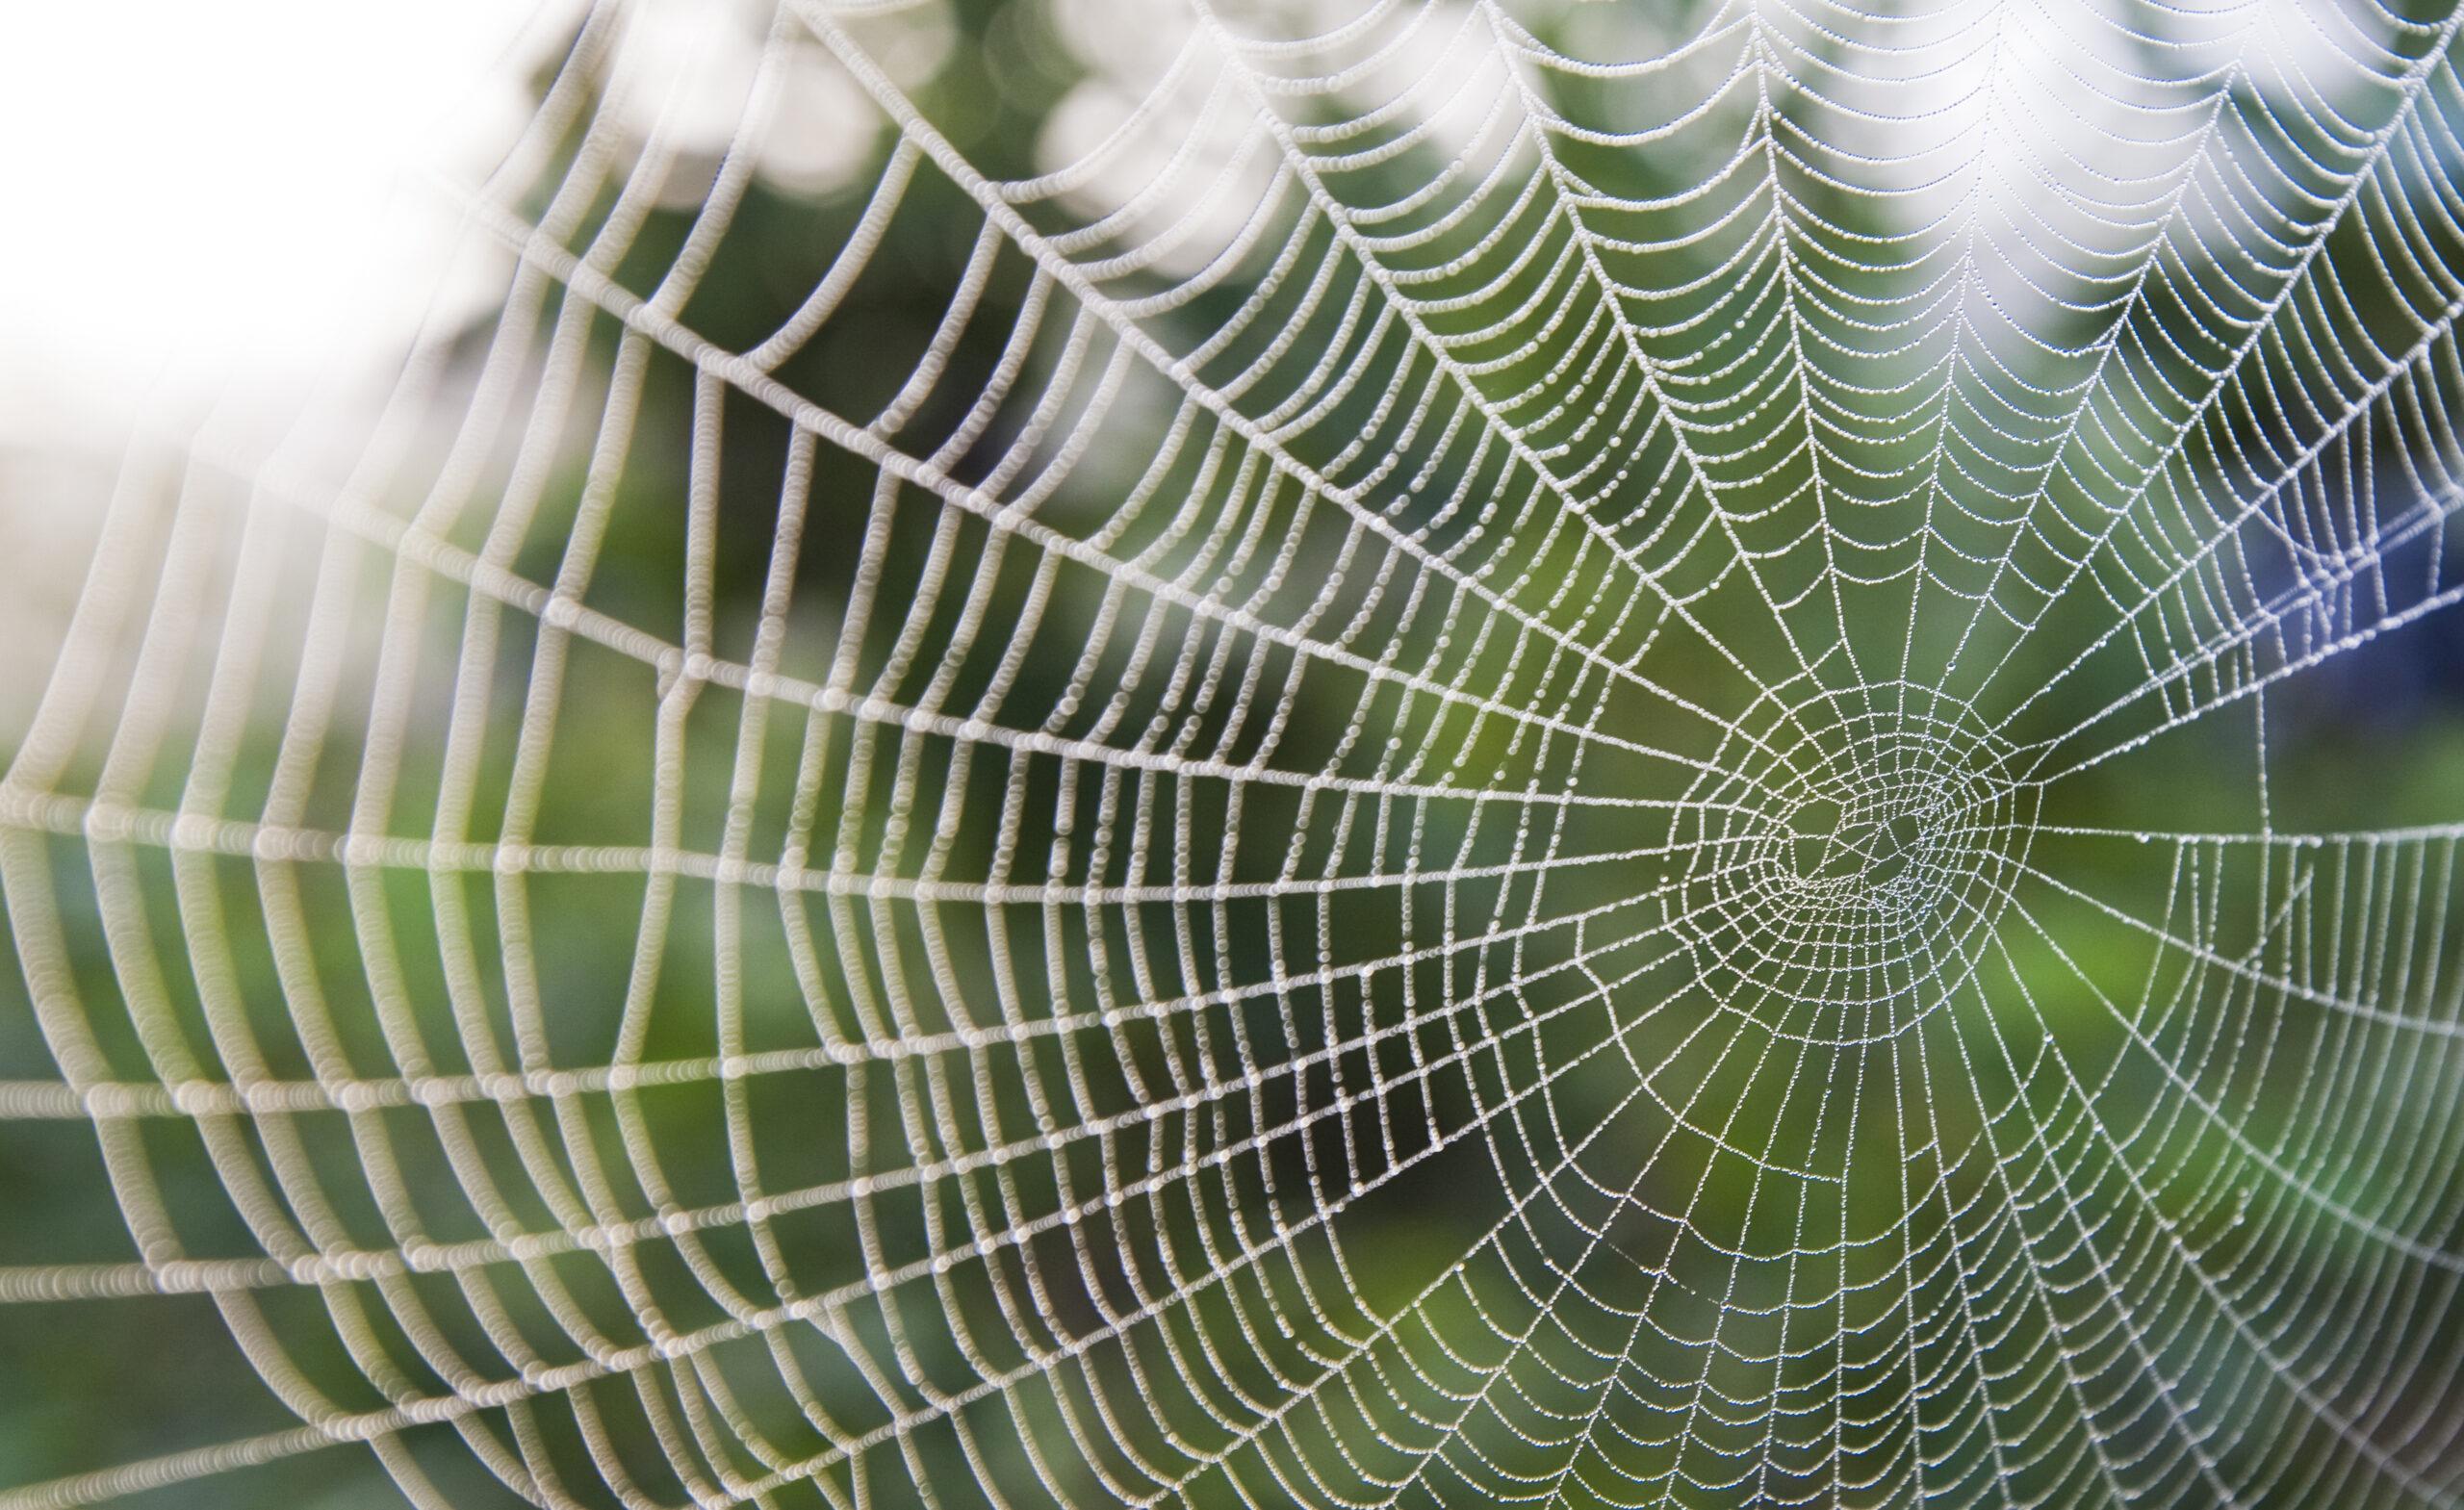 spindelnät,spindel,nät,nätverk,grön